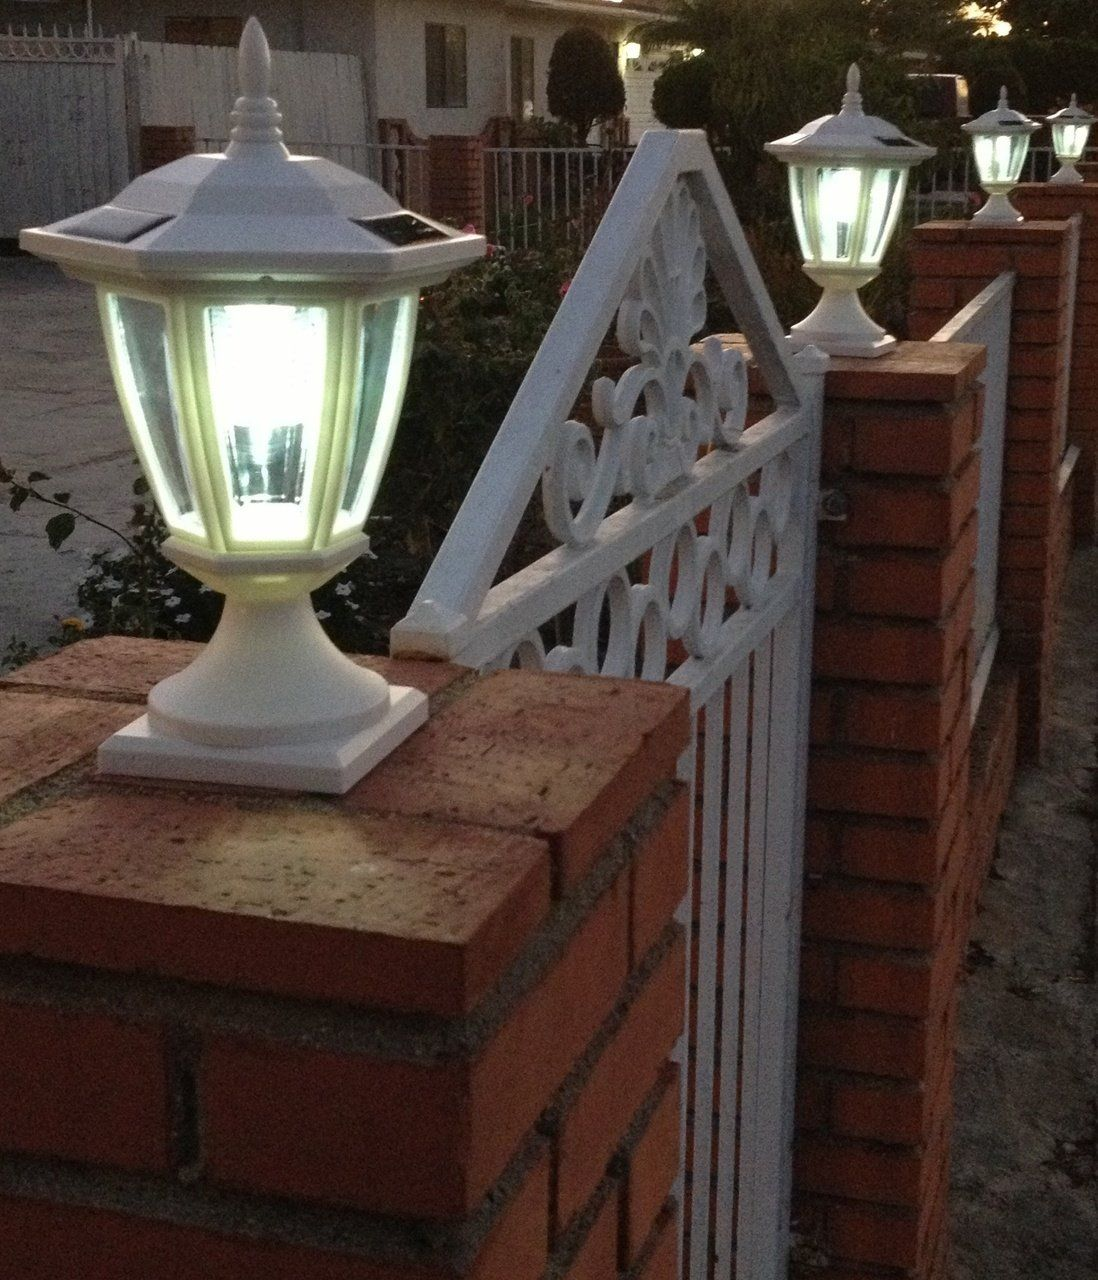 2 Pk Solar Hexagon Light W Wall Mount Or Fence Post Cap Base 4 5 6 Accessory 3 3 4 X 3 3 4 Base Lamp Post Lights Fence Post Caps Solar Led Lights